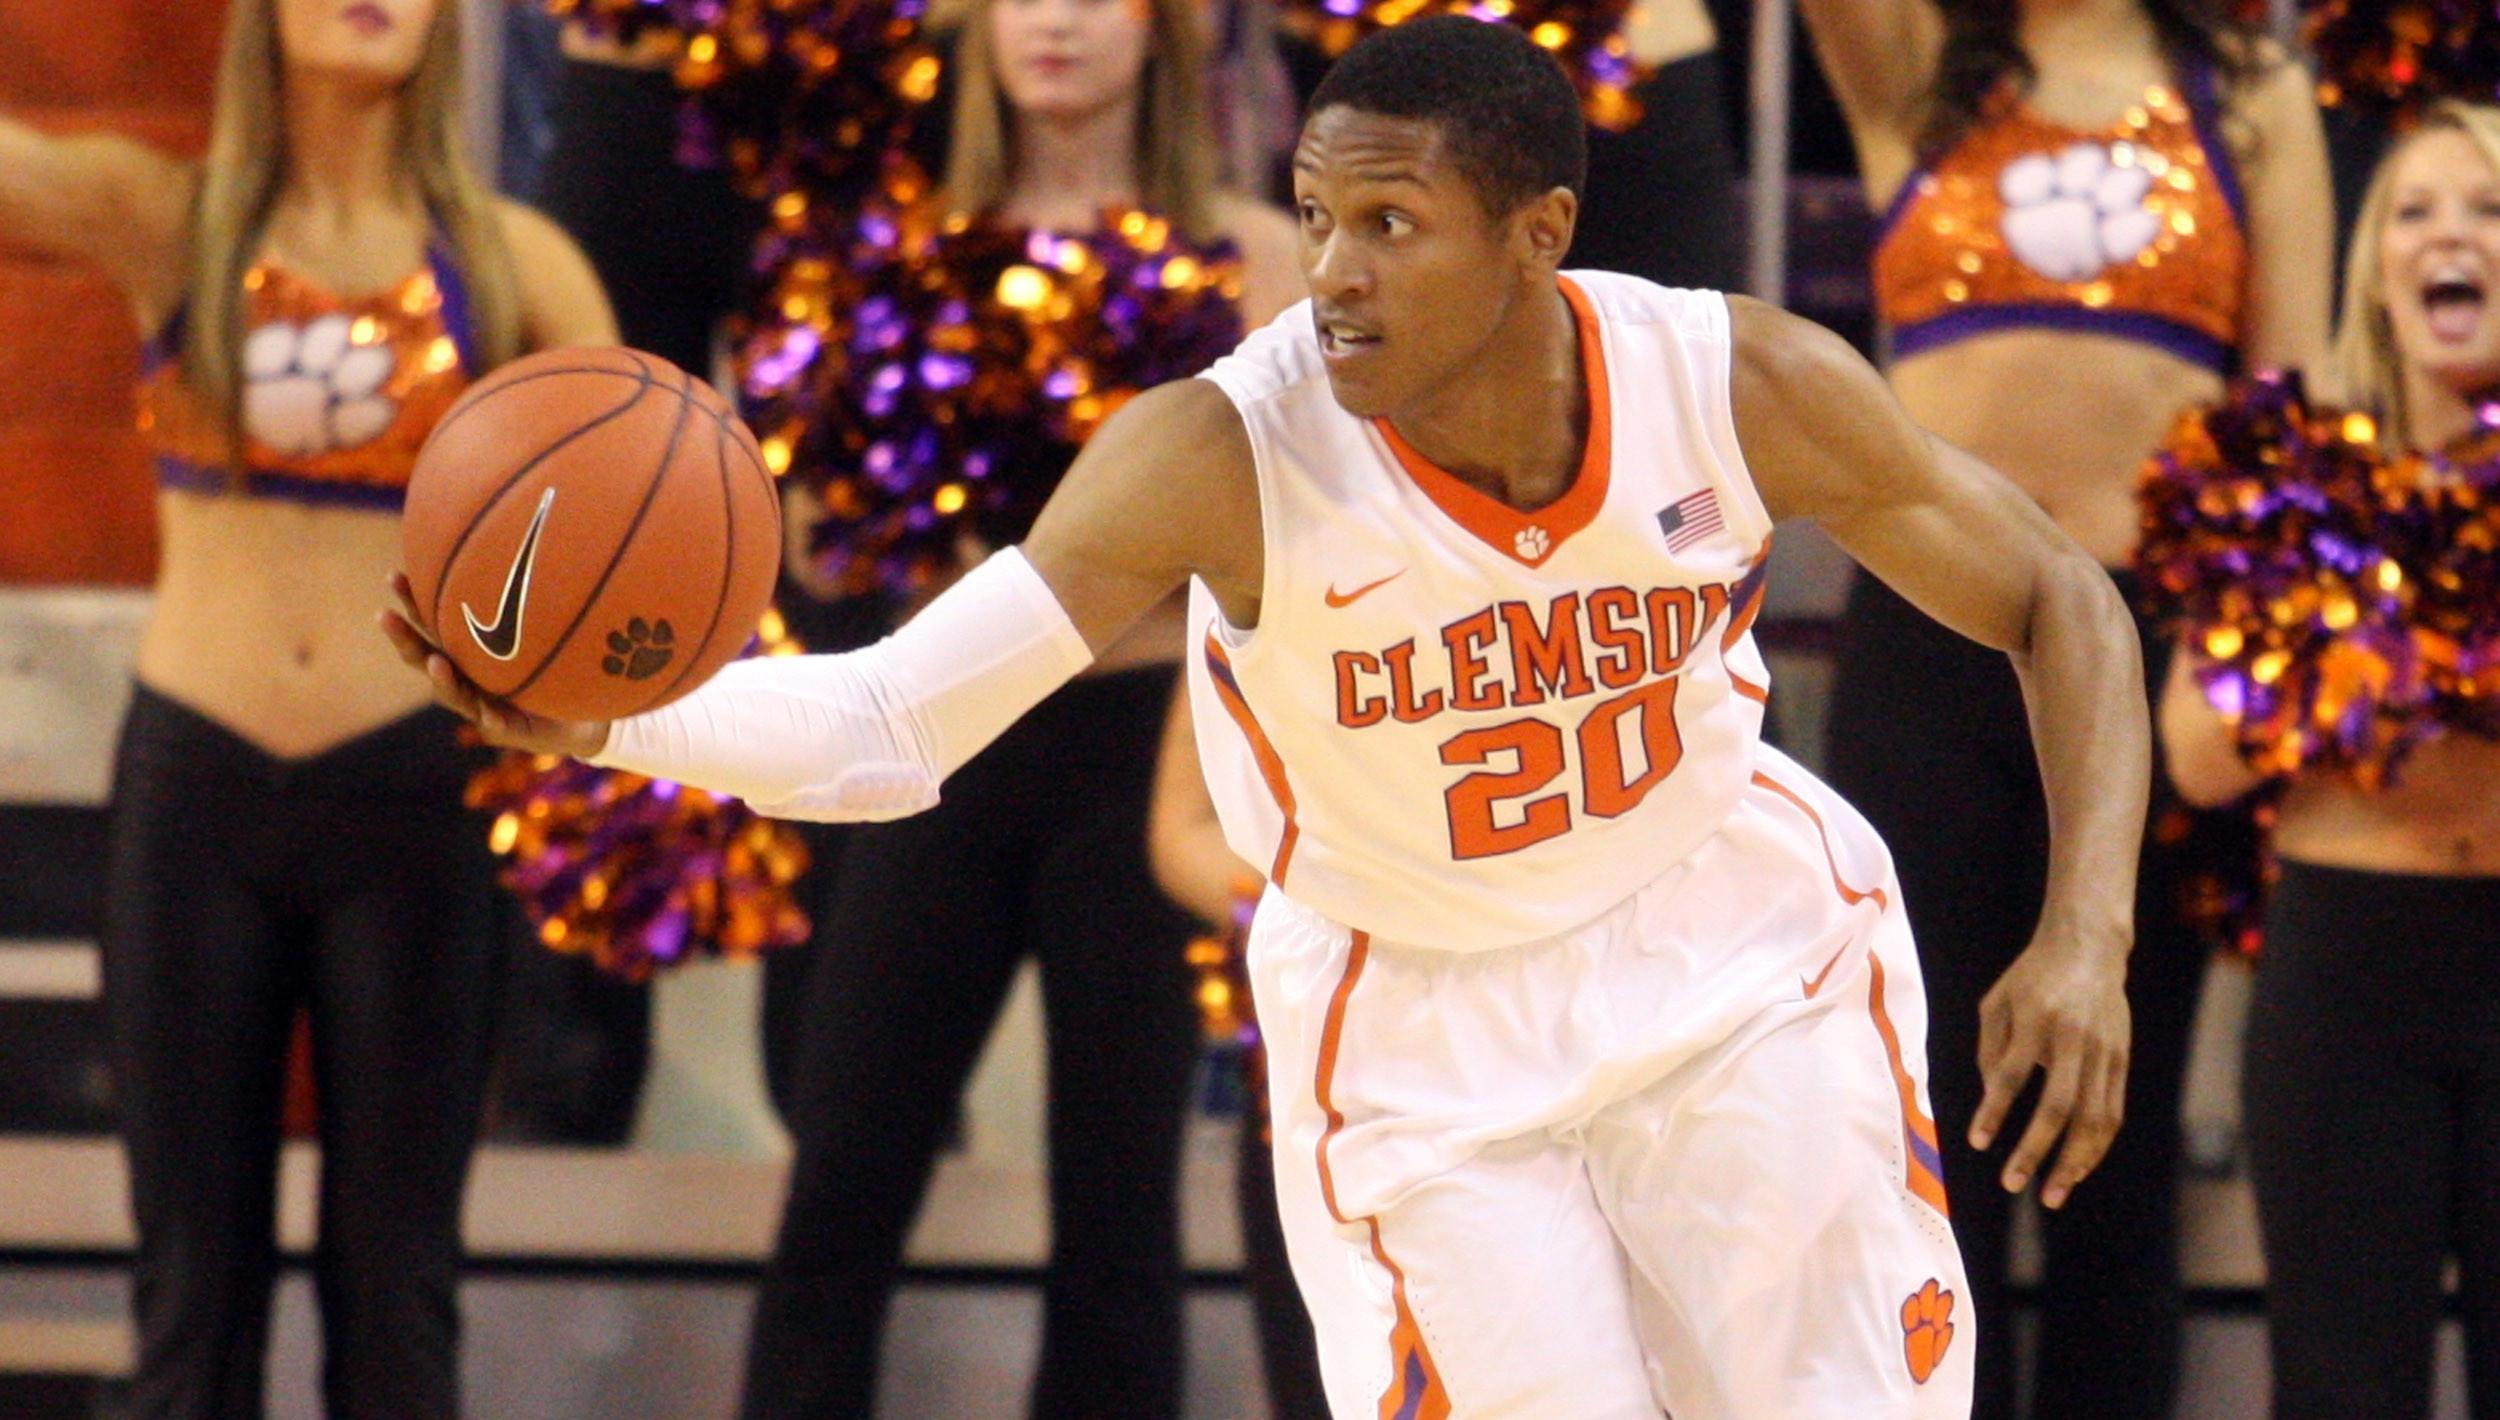 Tigers to Face South Carolina Sunday at Littlejohn Coliseum